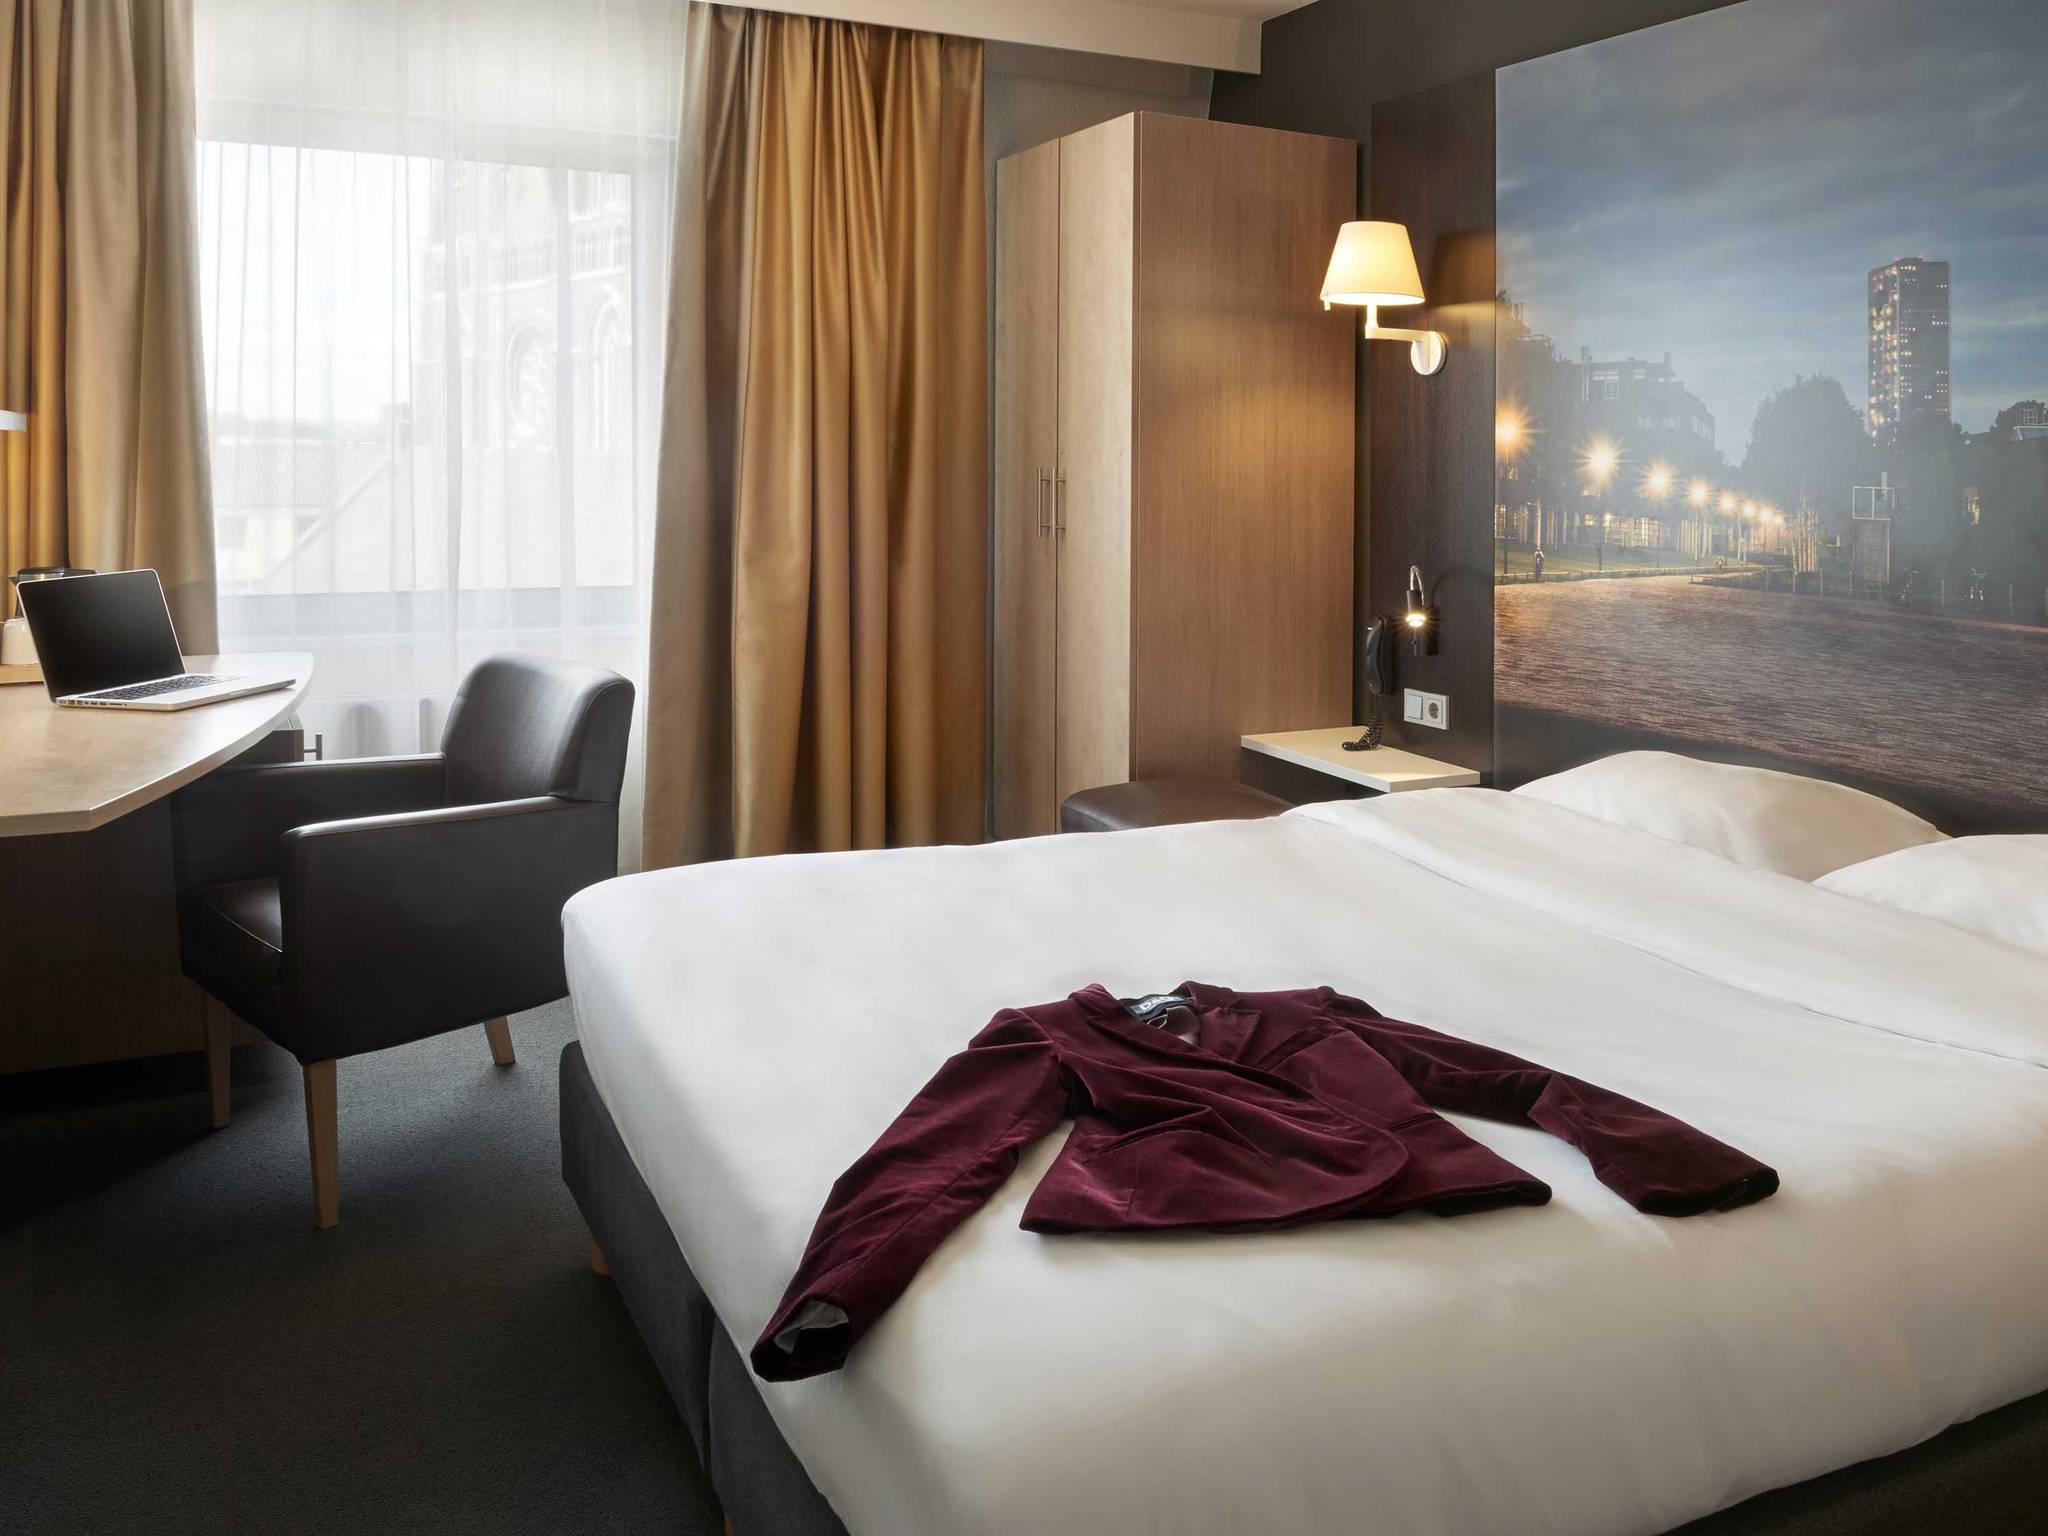 Hotel – Mercure Hotel Tilburg Centrum